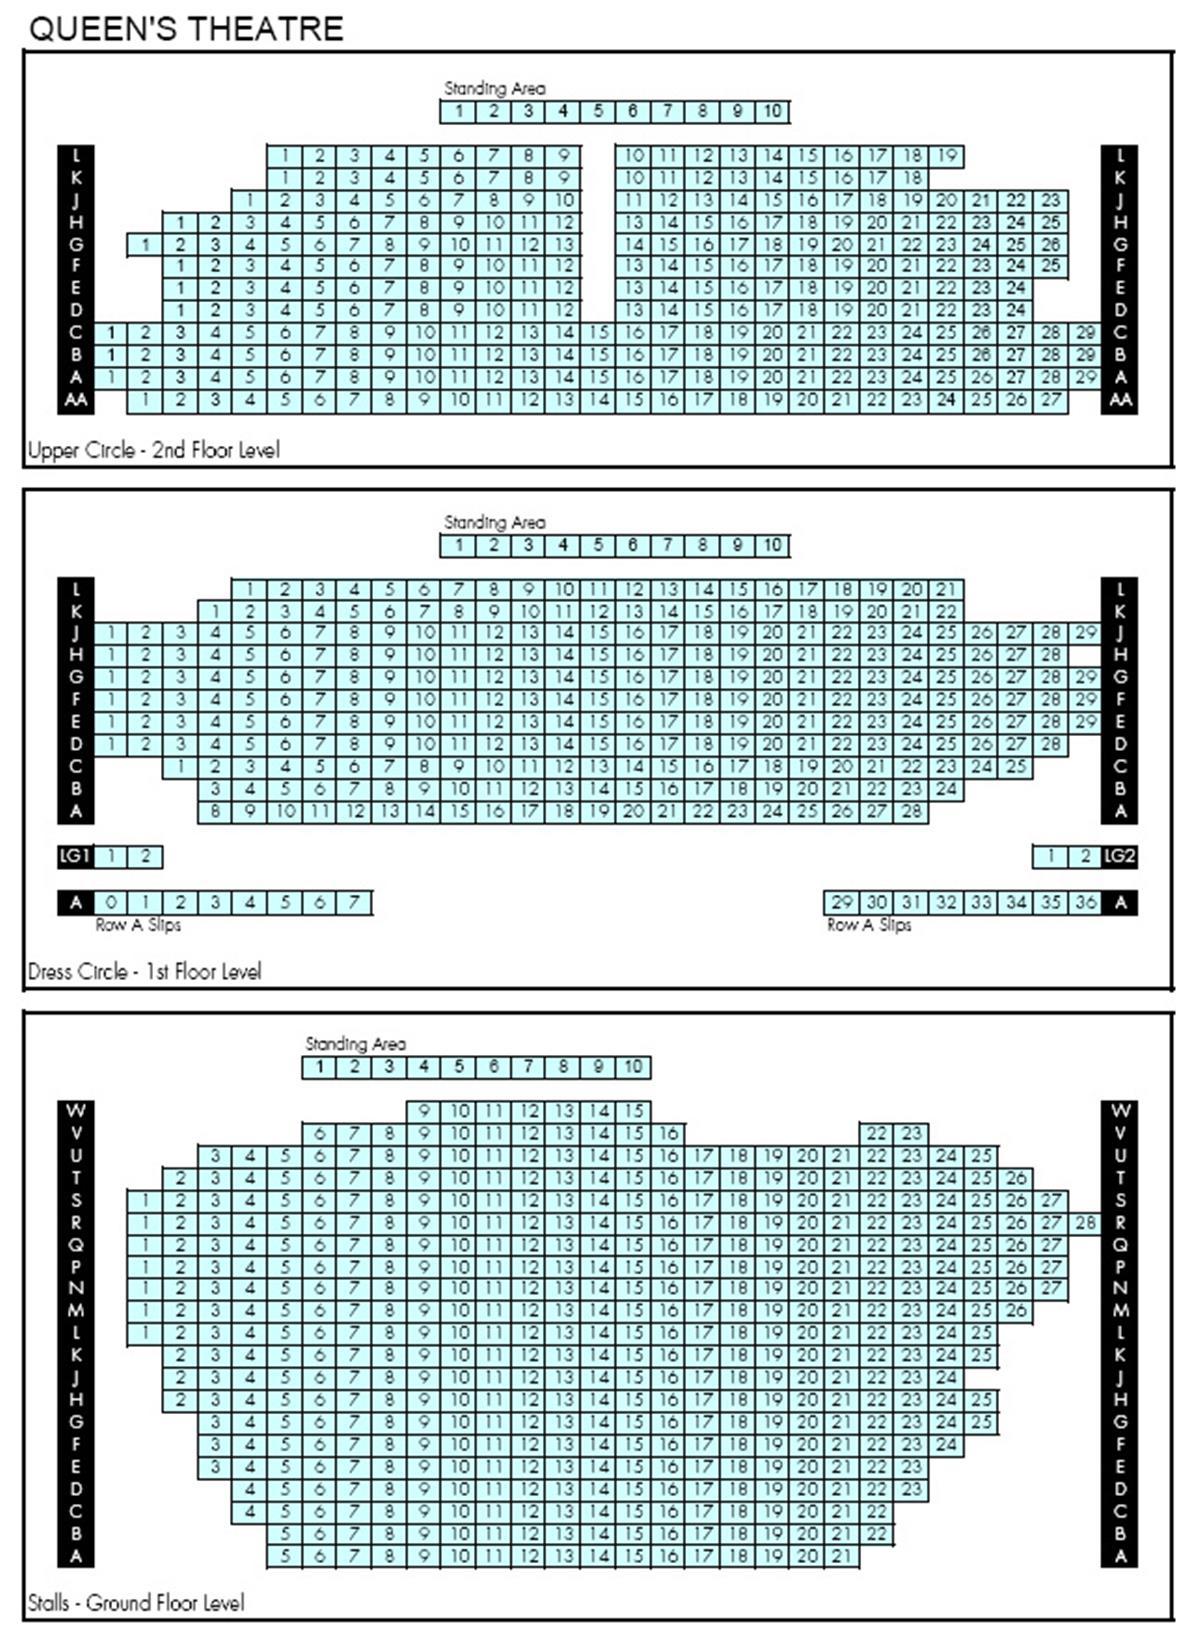 Queens Theatre Seat Plan for Les Miserables